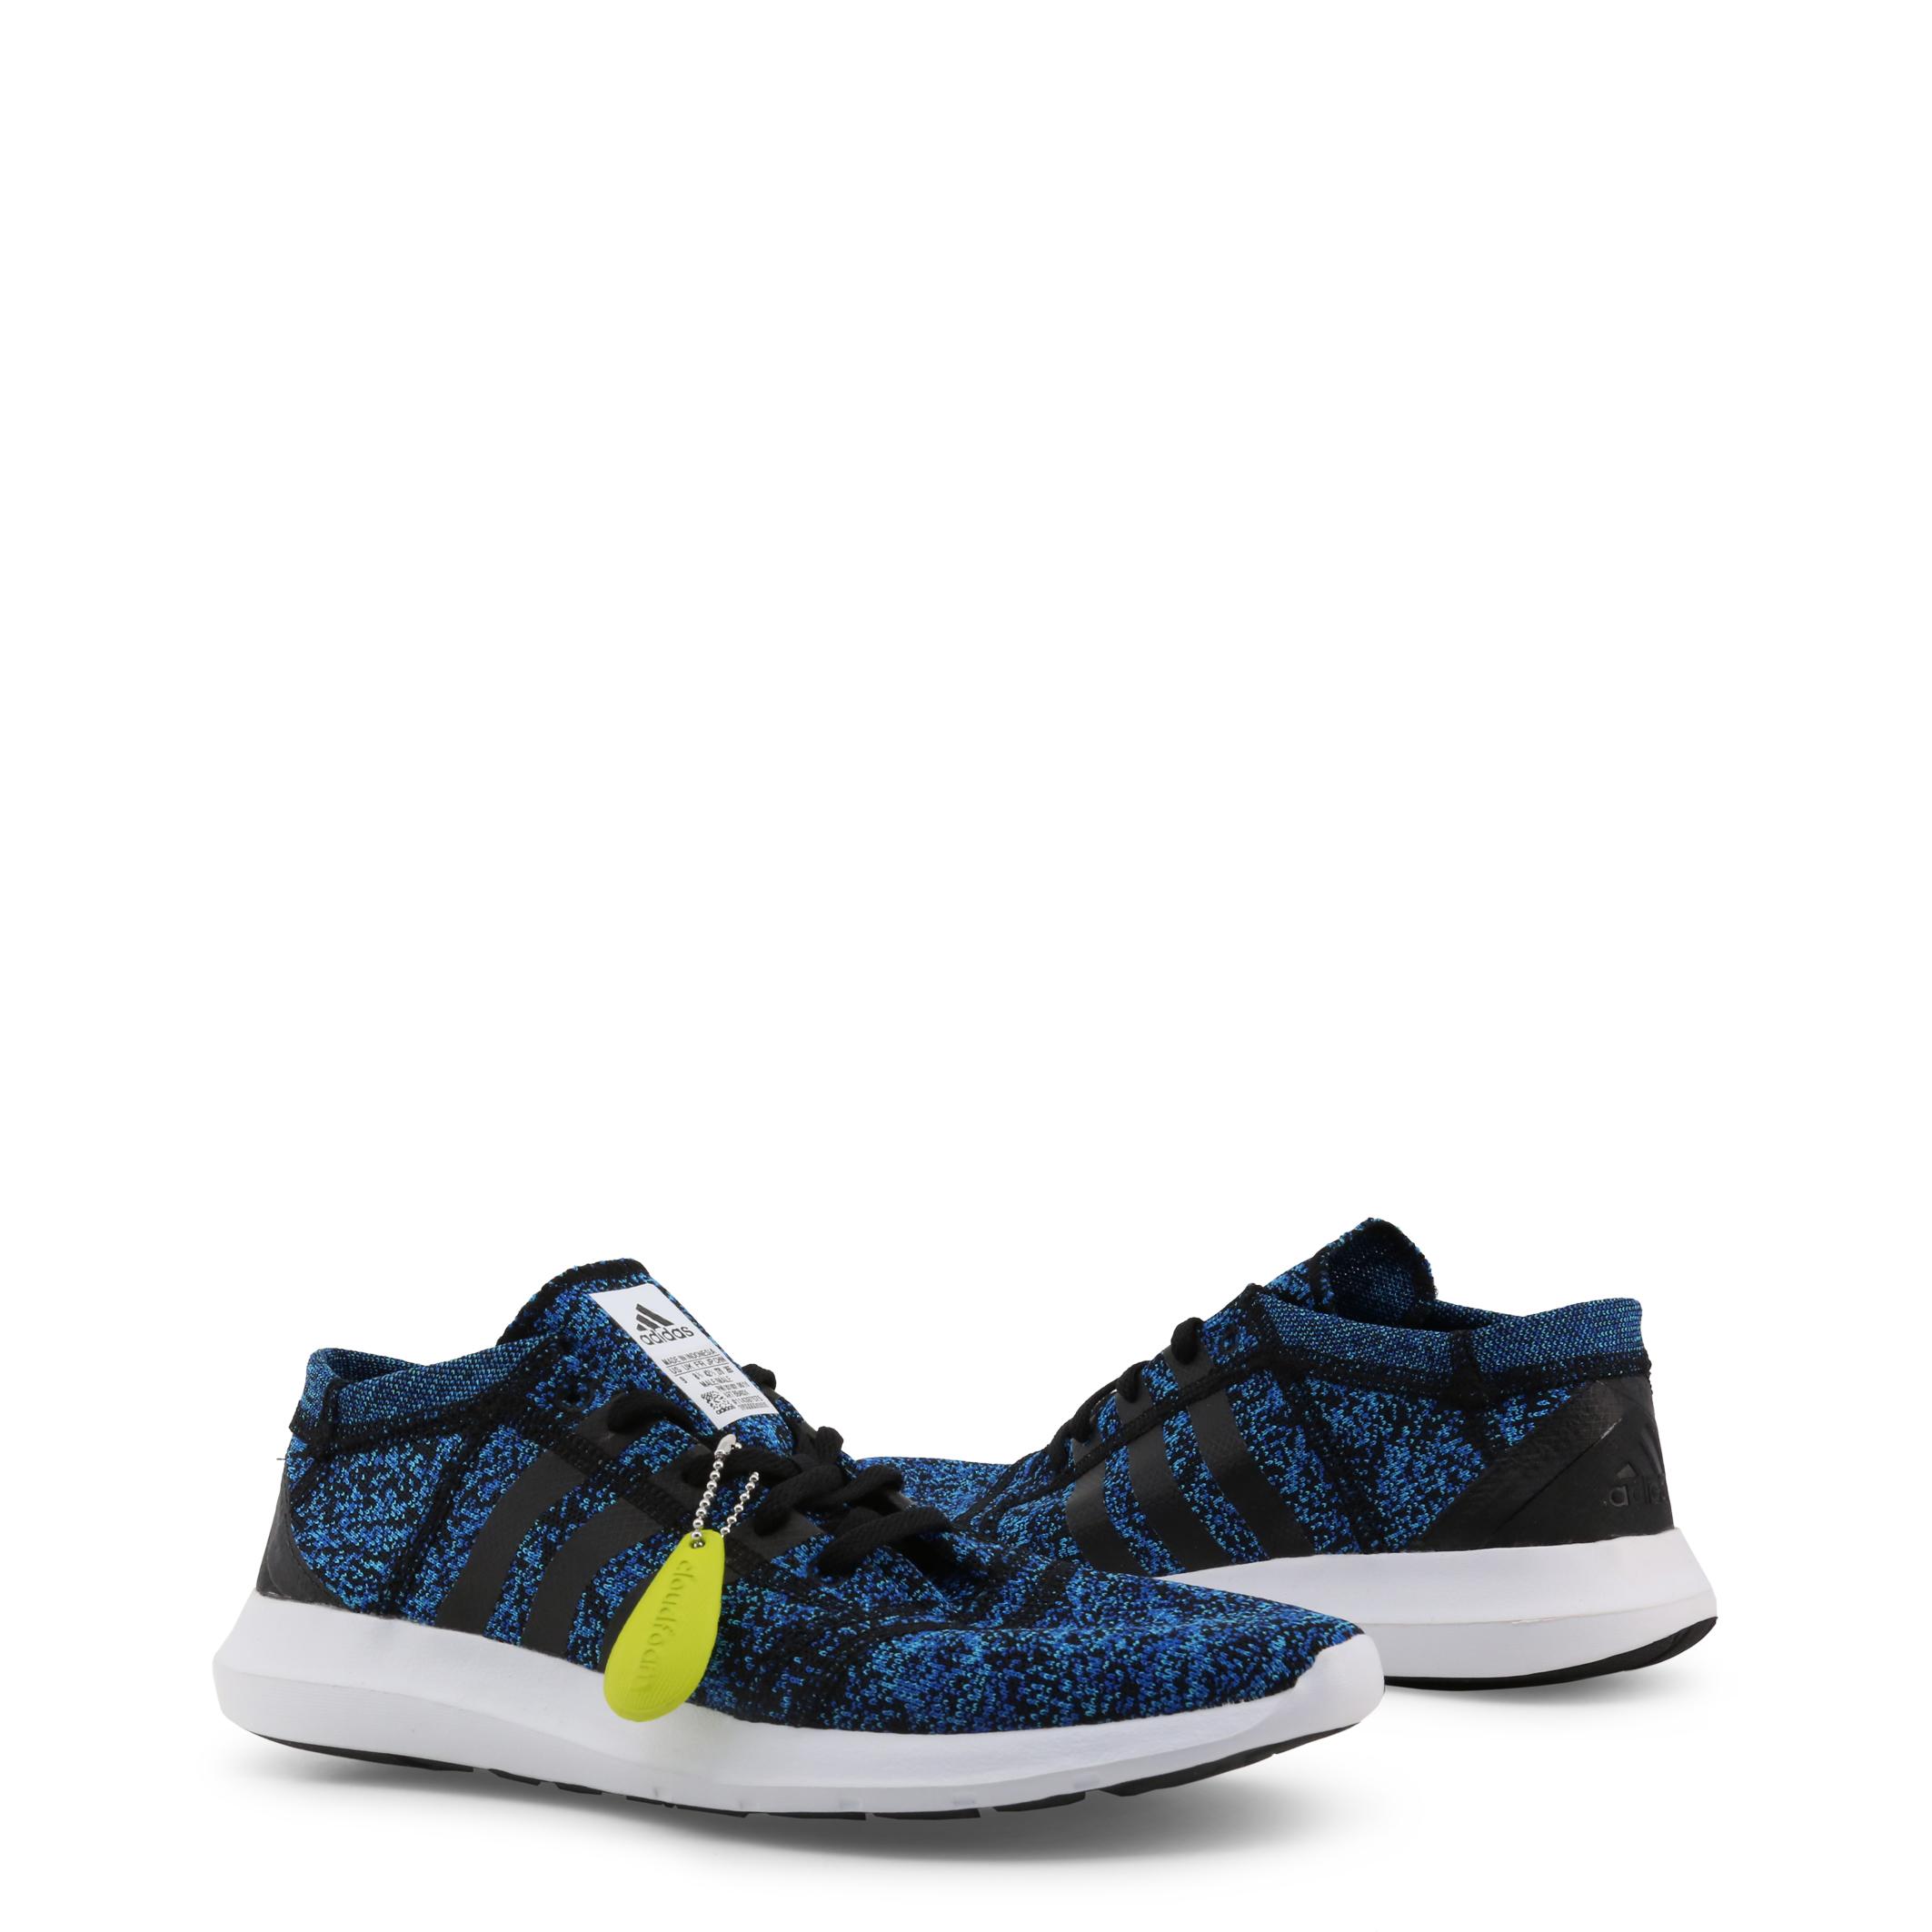 Sneakers-Adidas-ELEMENTS-REFINE2-Uomo-Blu-97924 miniatura 2